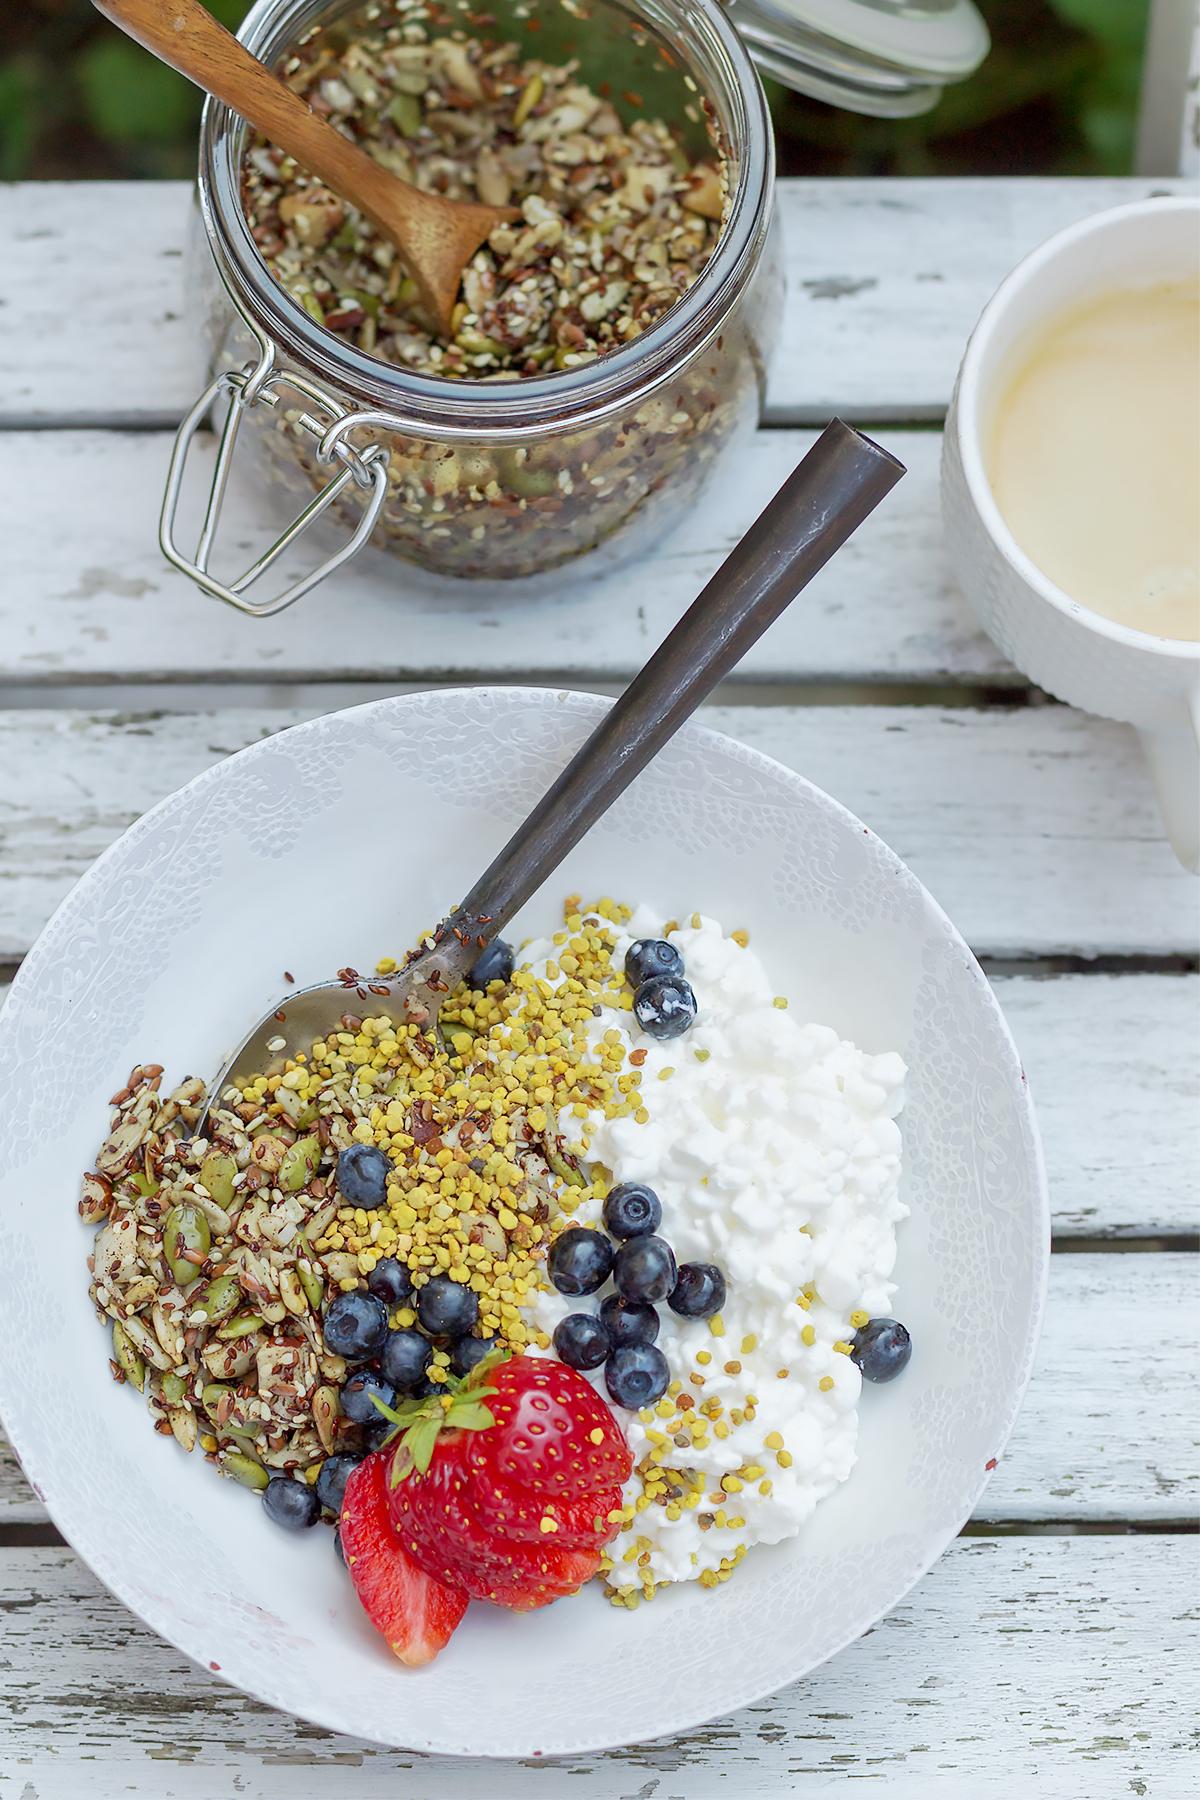 lchf kuchnia granola kup dietę odchudzanie